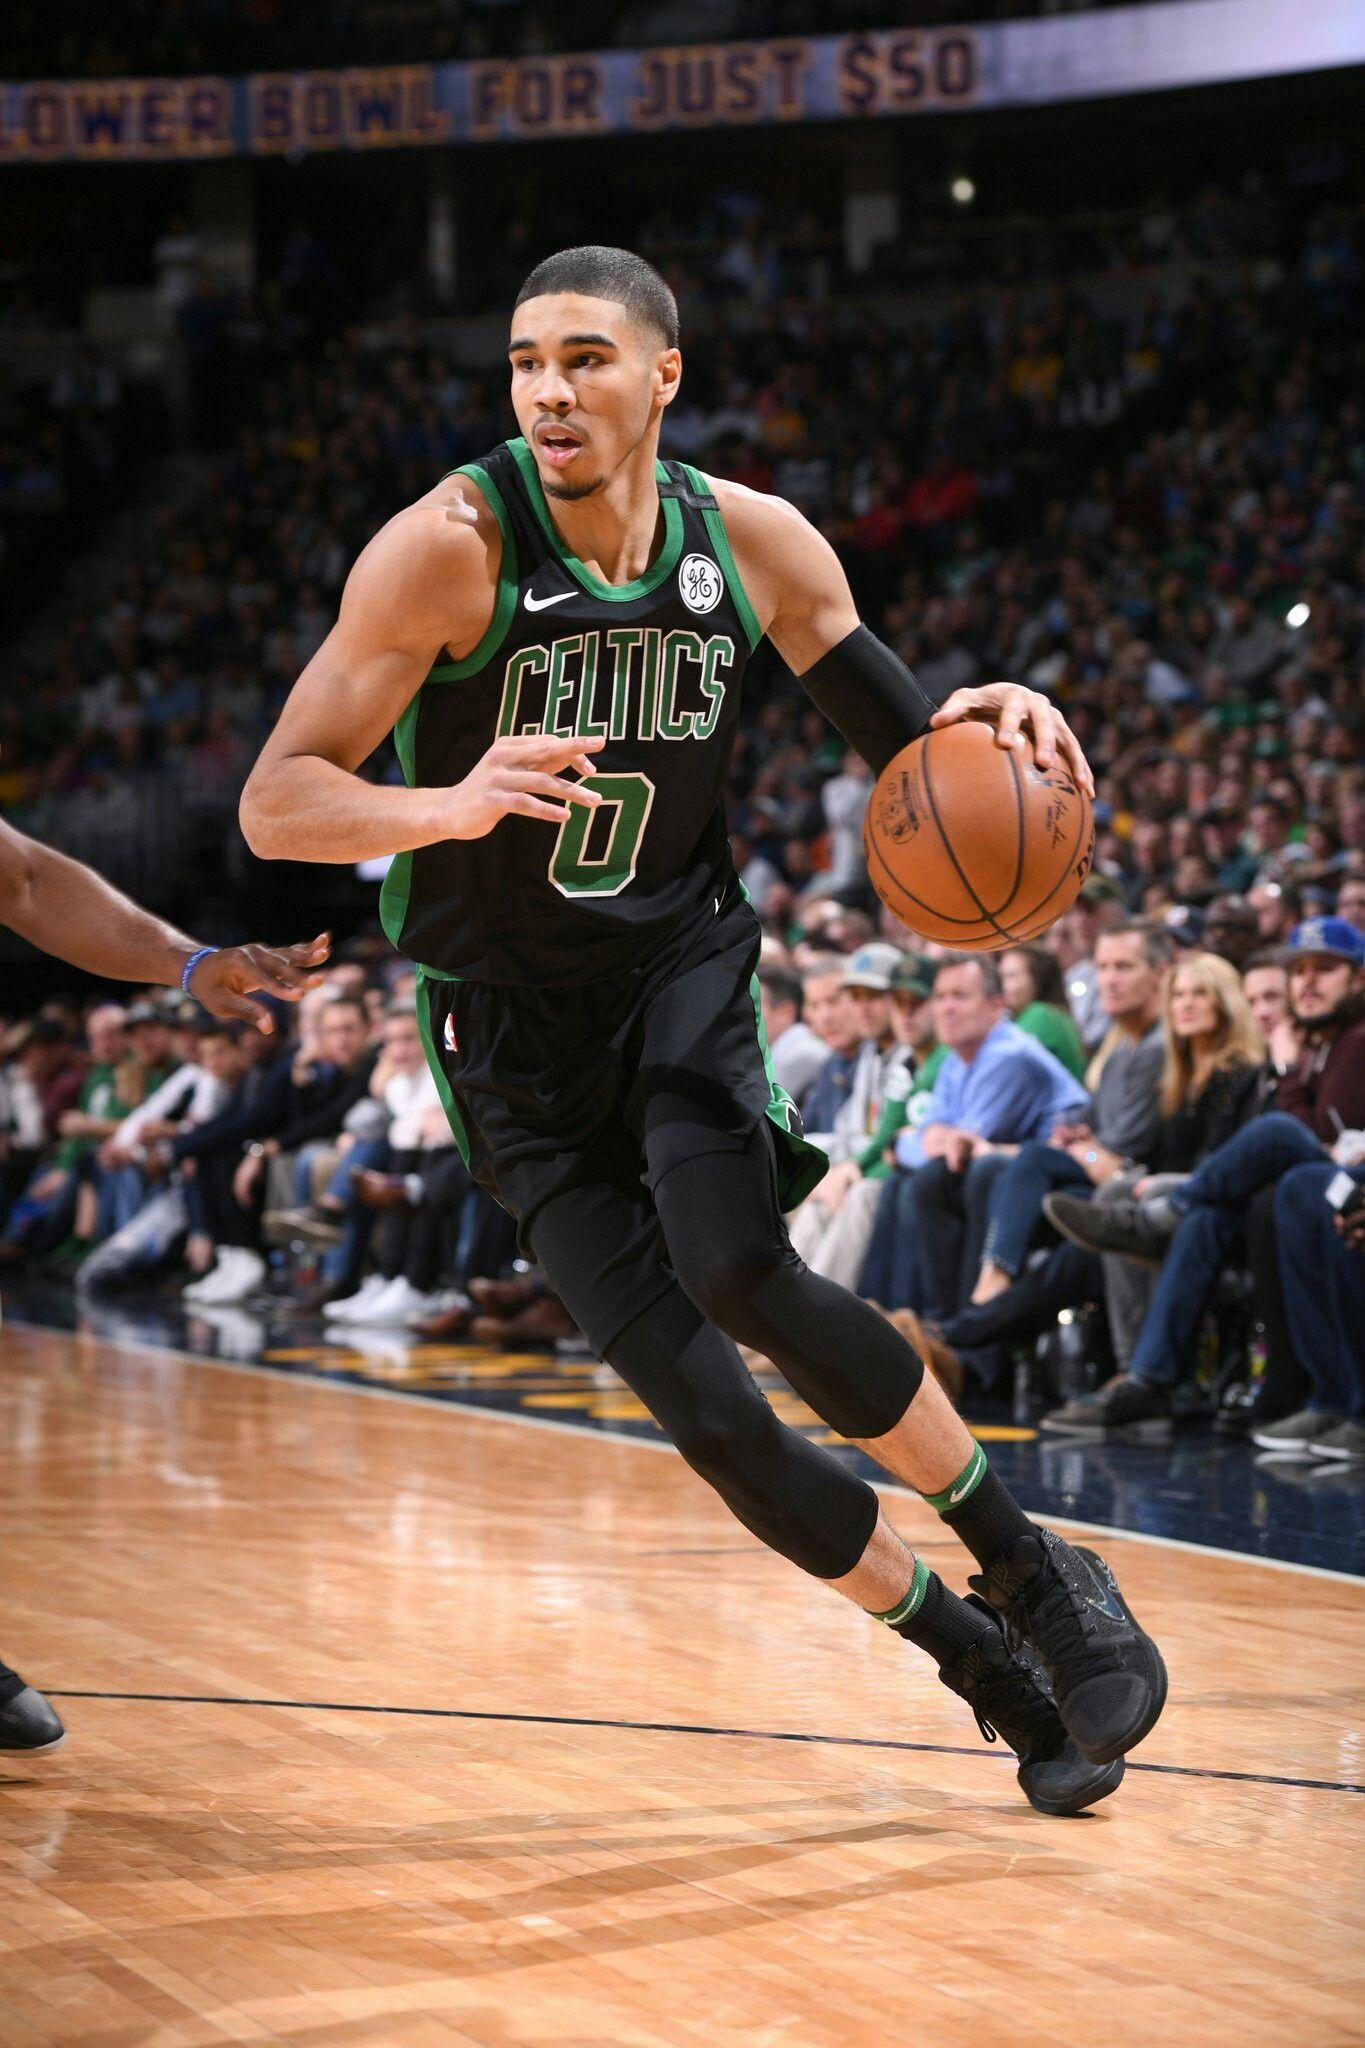 Pin By Aaron Ramos On Perfection Jayson Tatum Celtics Basketball Basketball Players